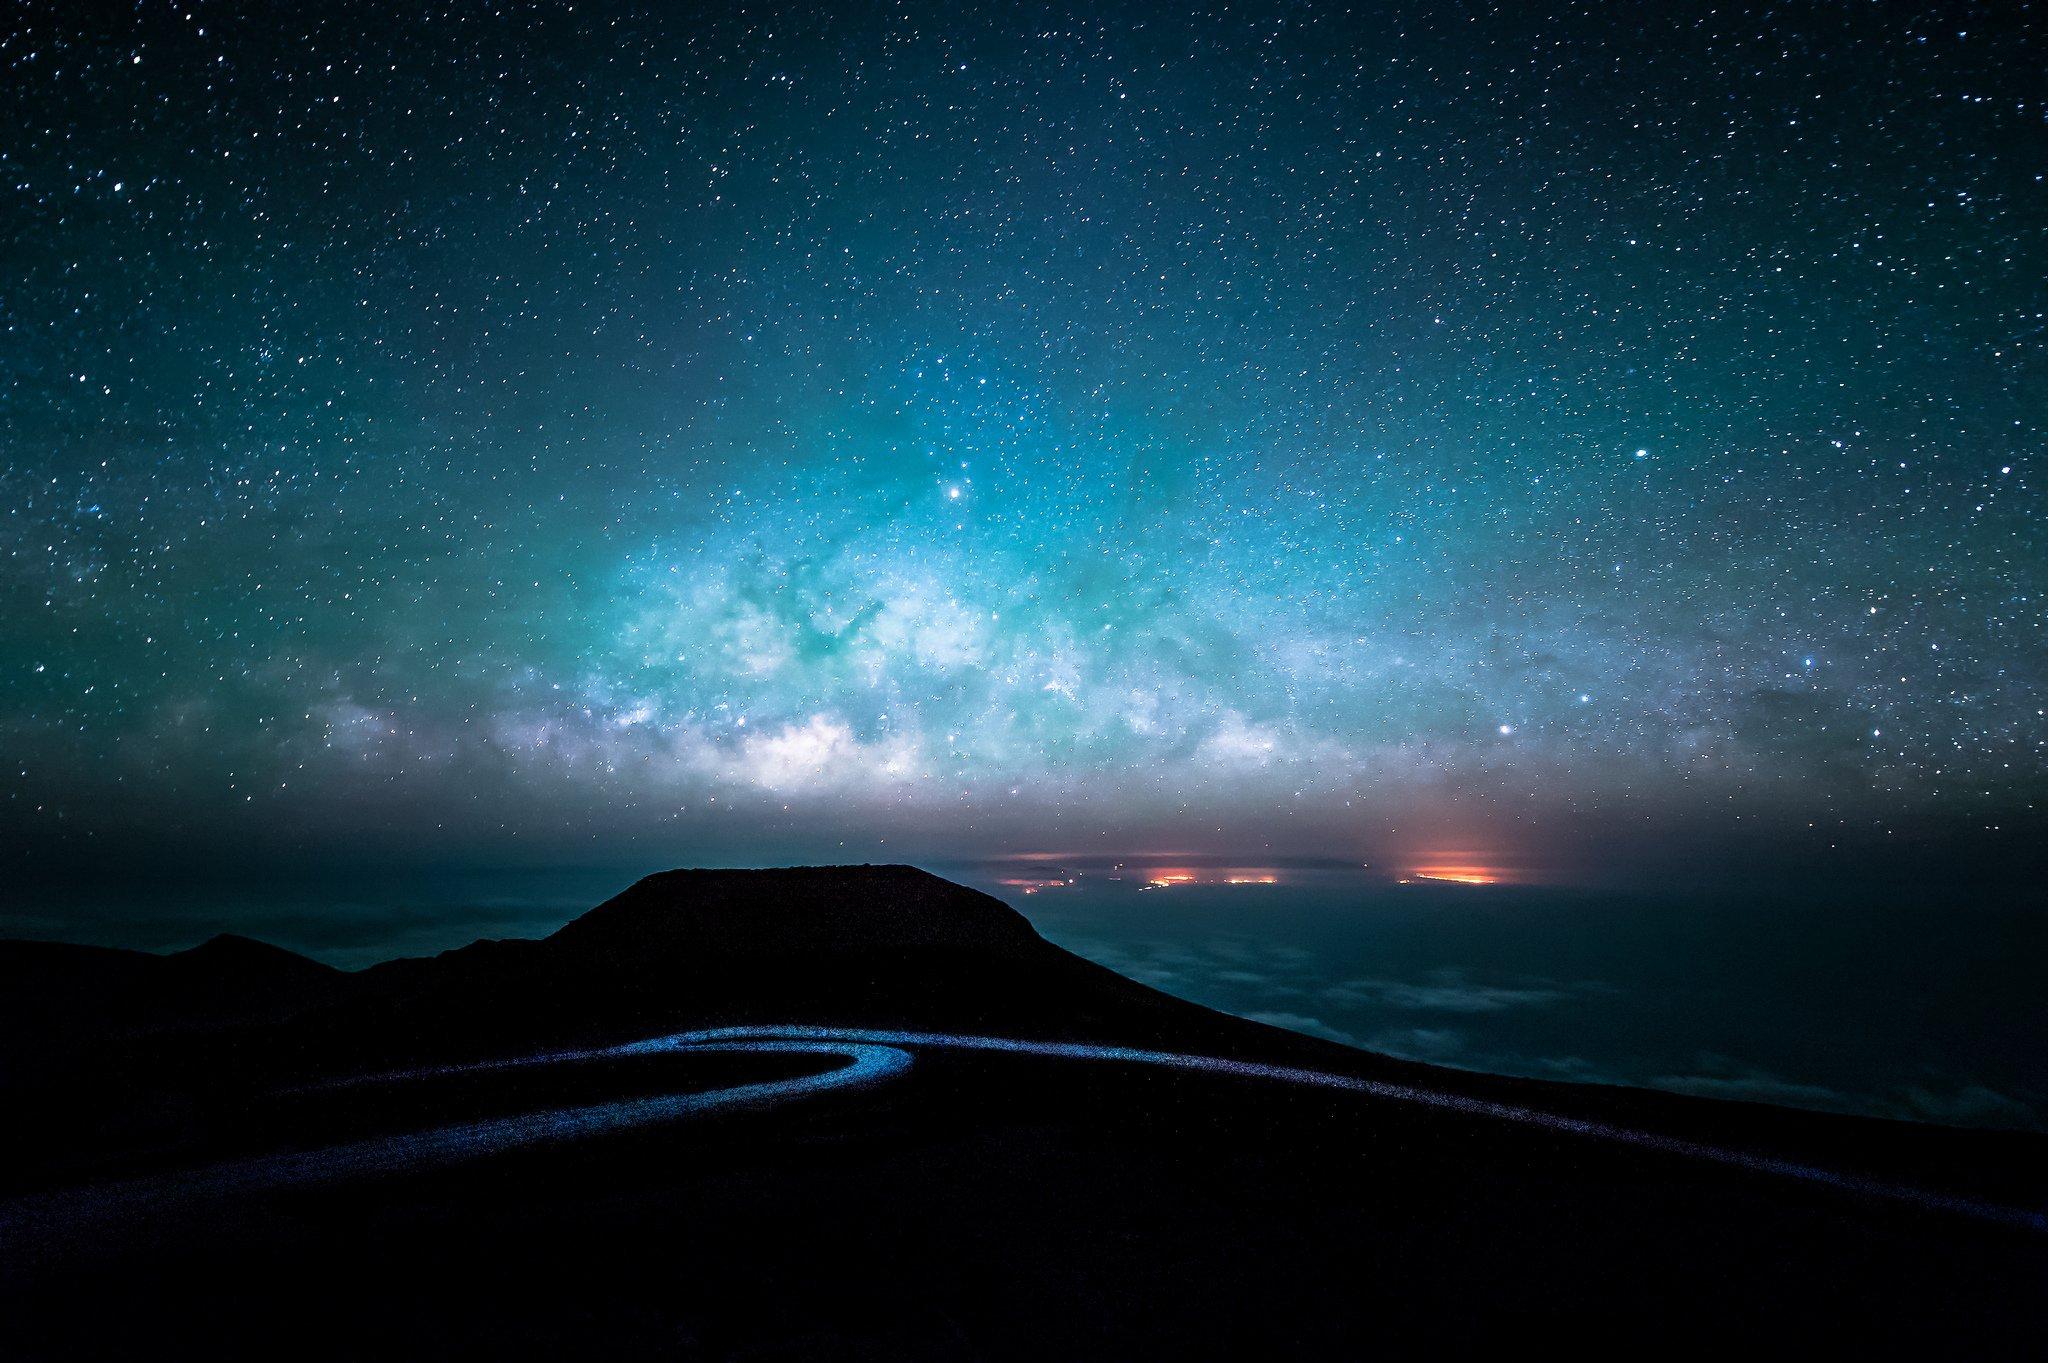 denser in middle night sky milky way galaxy - photo #23